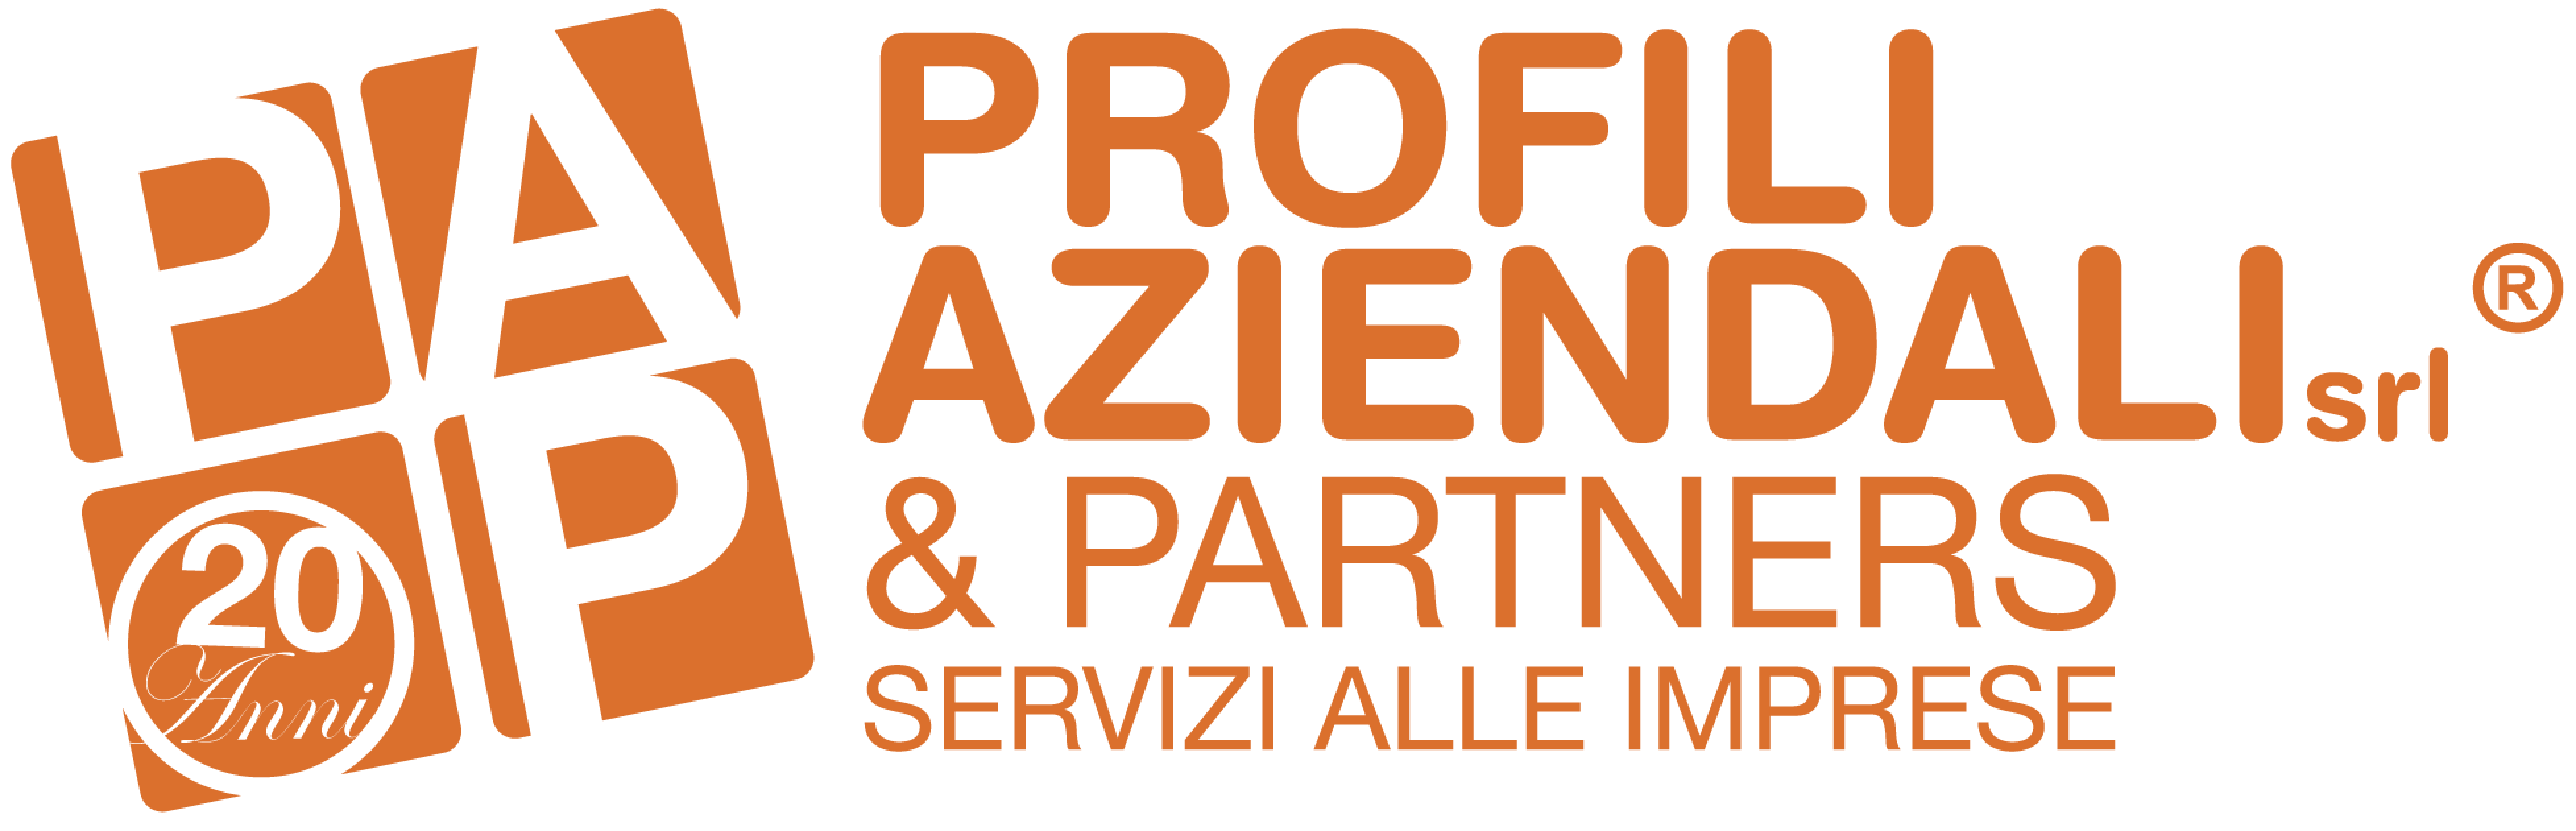 Aule Online by Profili Aziendali & Partners